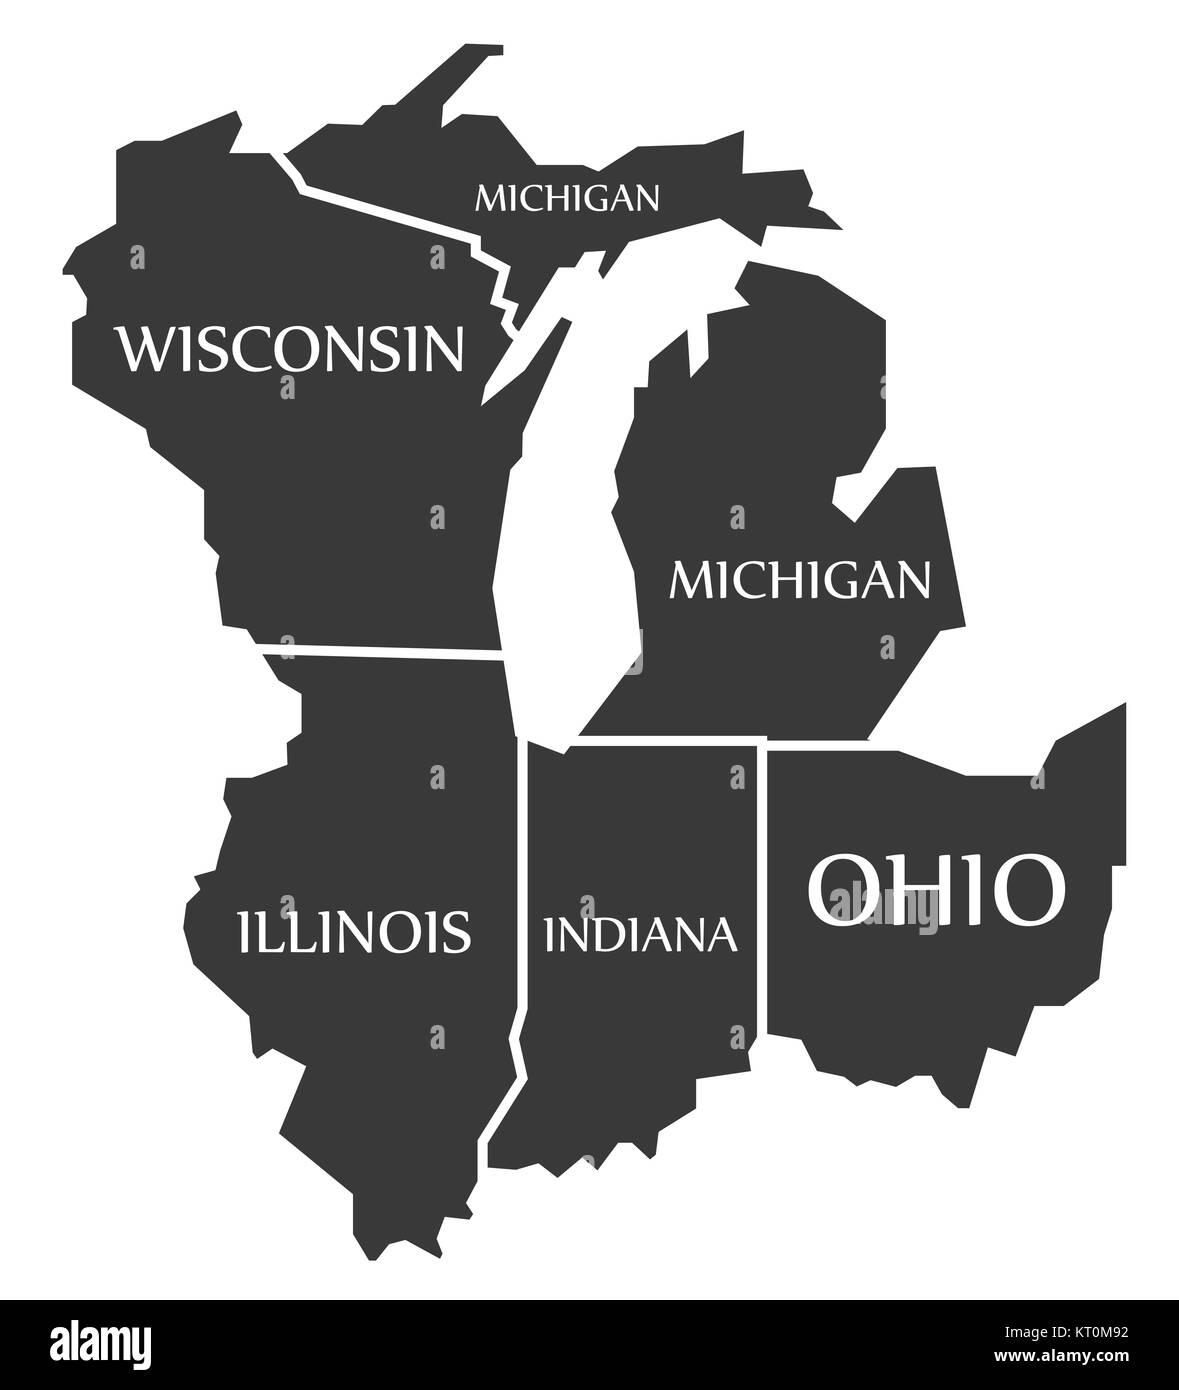 Wisconsin Illinois Map Michigan   Wisconsin   Illinois   Indiana   Ohio Map labelled